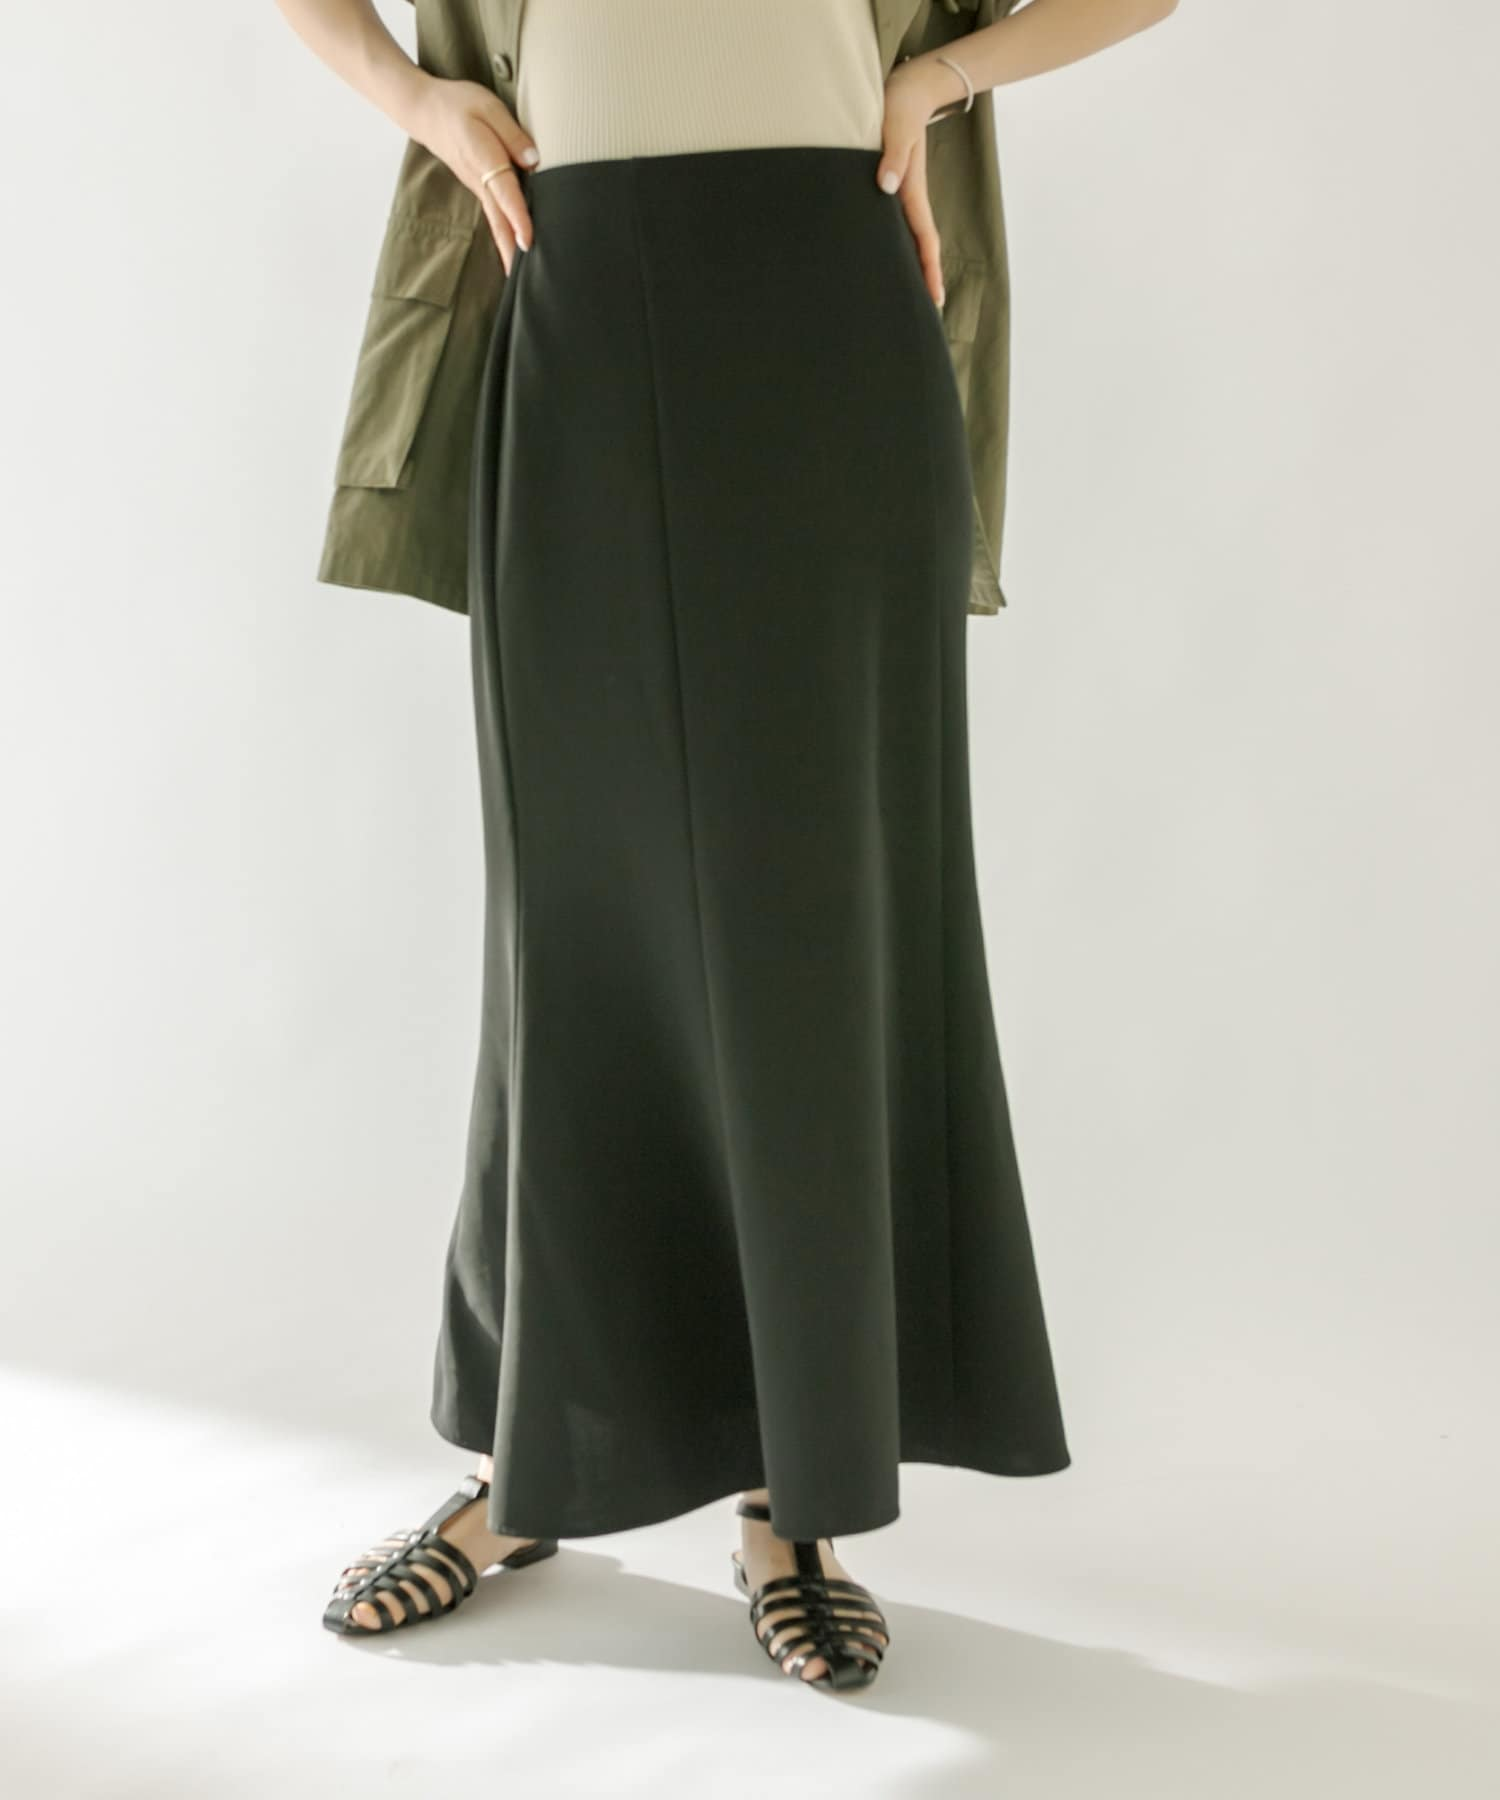 mystic(ミスティック) ストレッチマーメイドスカート